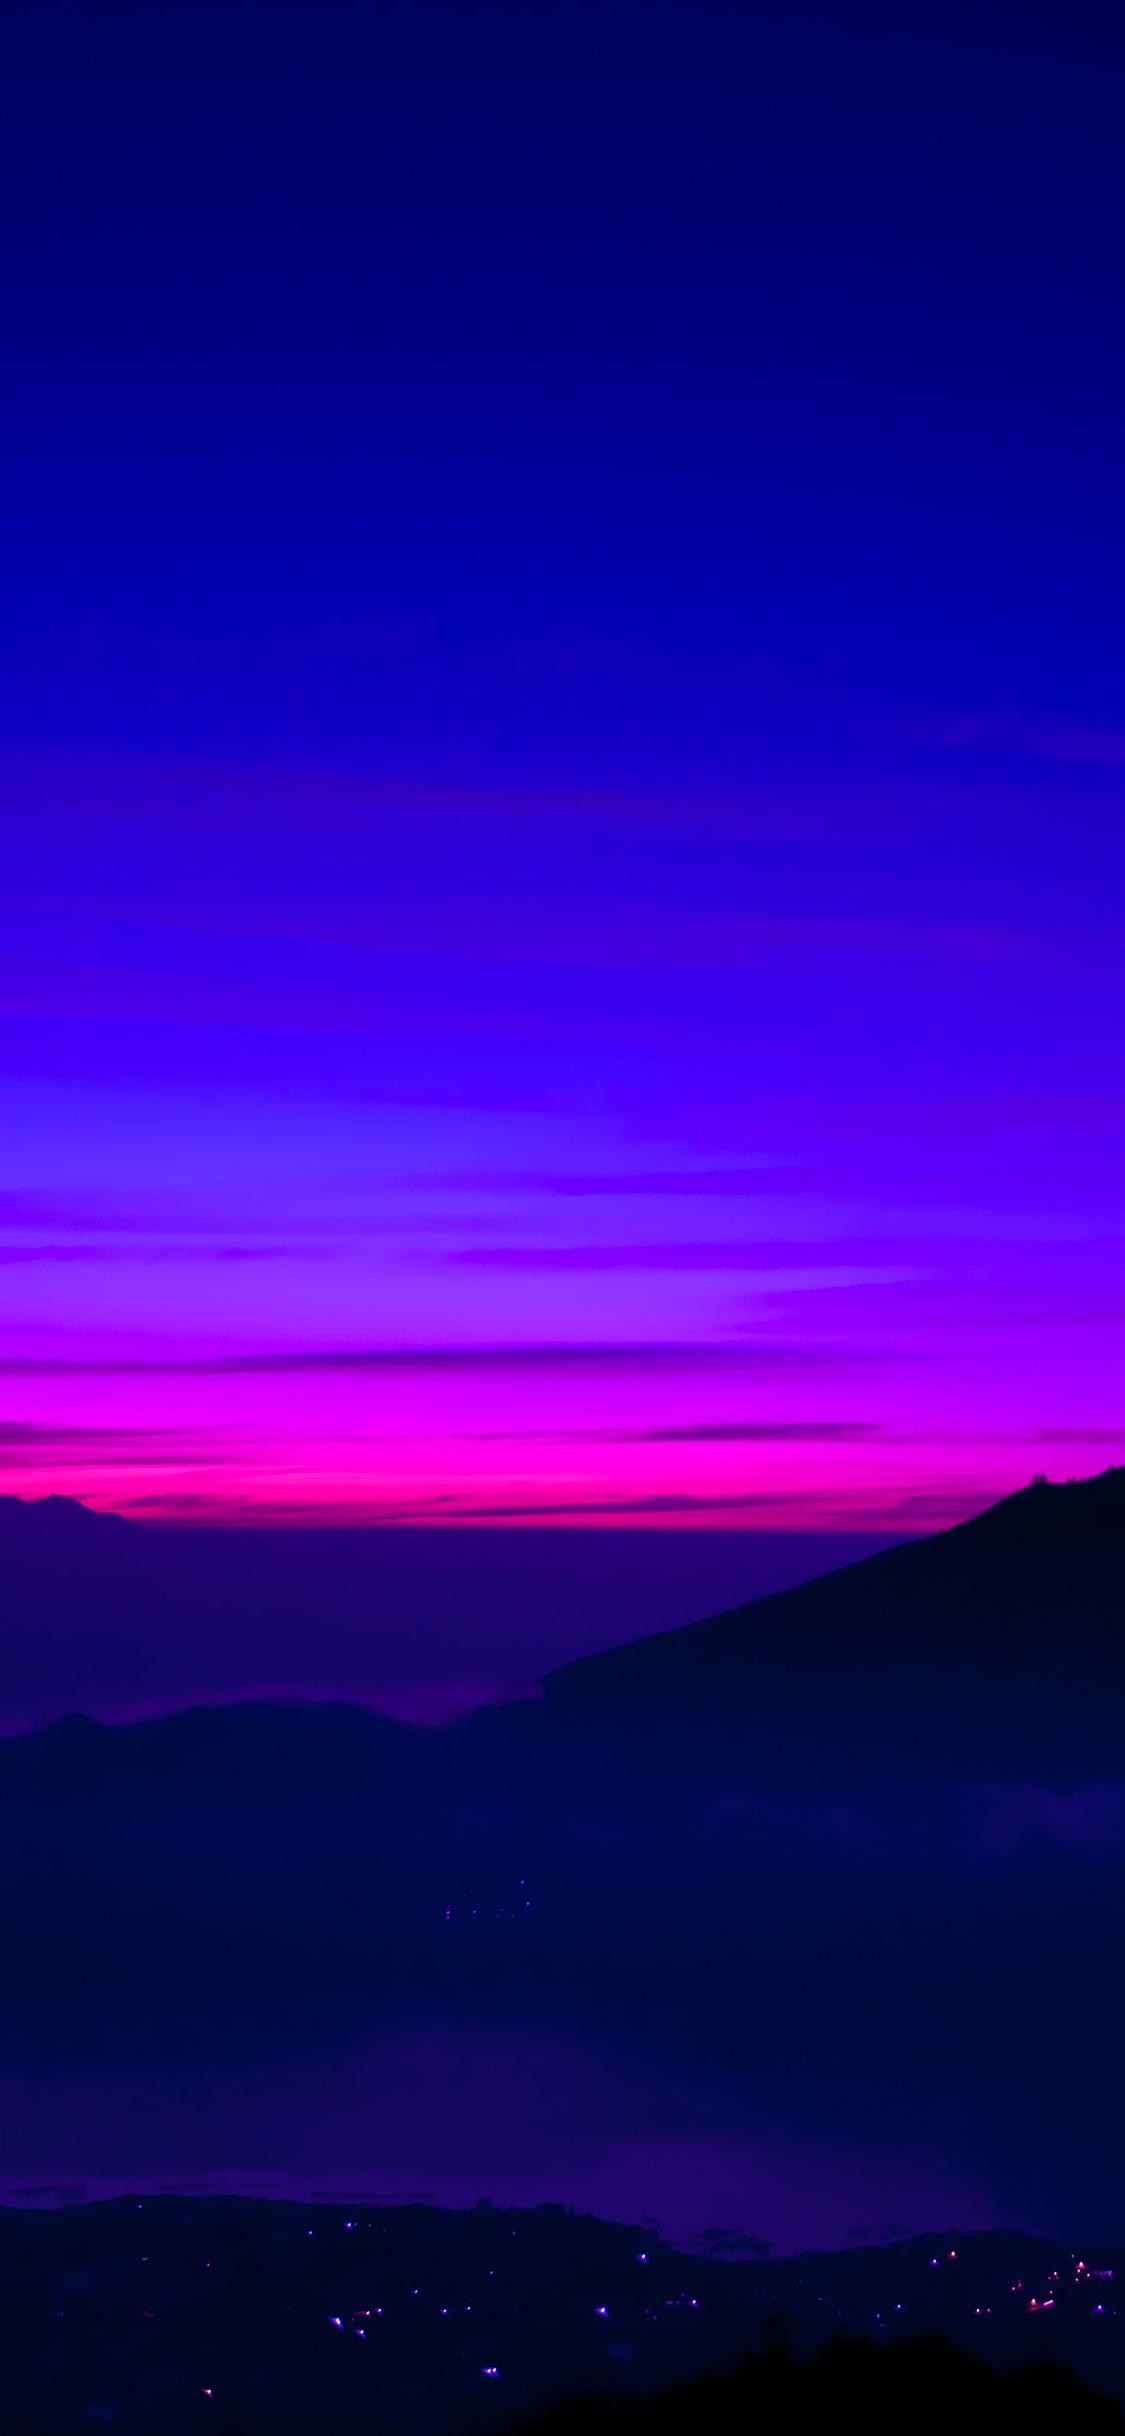 iPhoneXpapers.com-Apple-iPhone-wallpaper-mc96-wallpaper-a-balinese-dream-sea-mountain-sunset